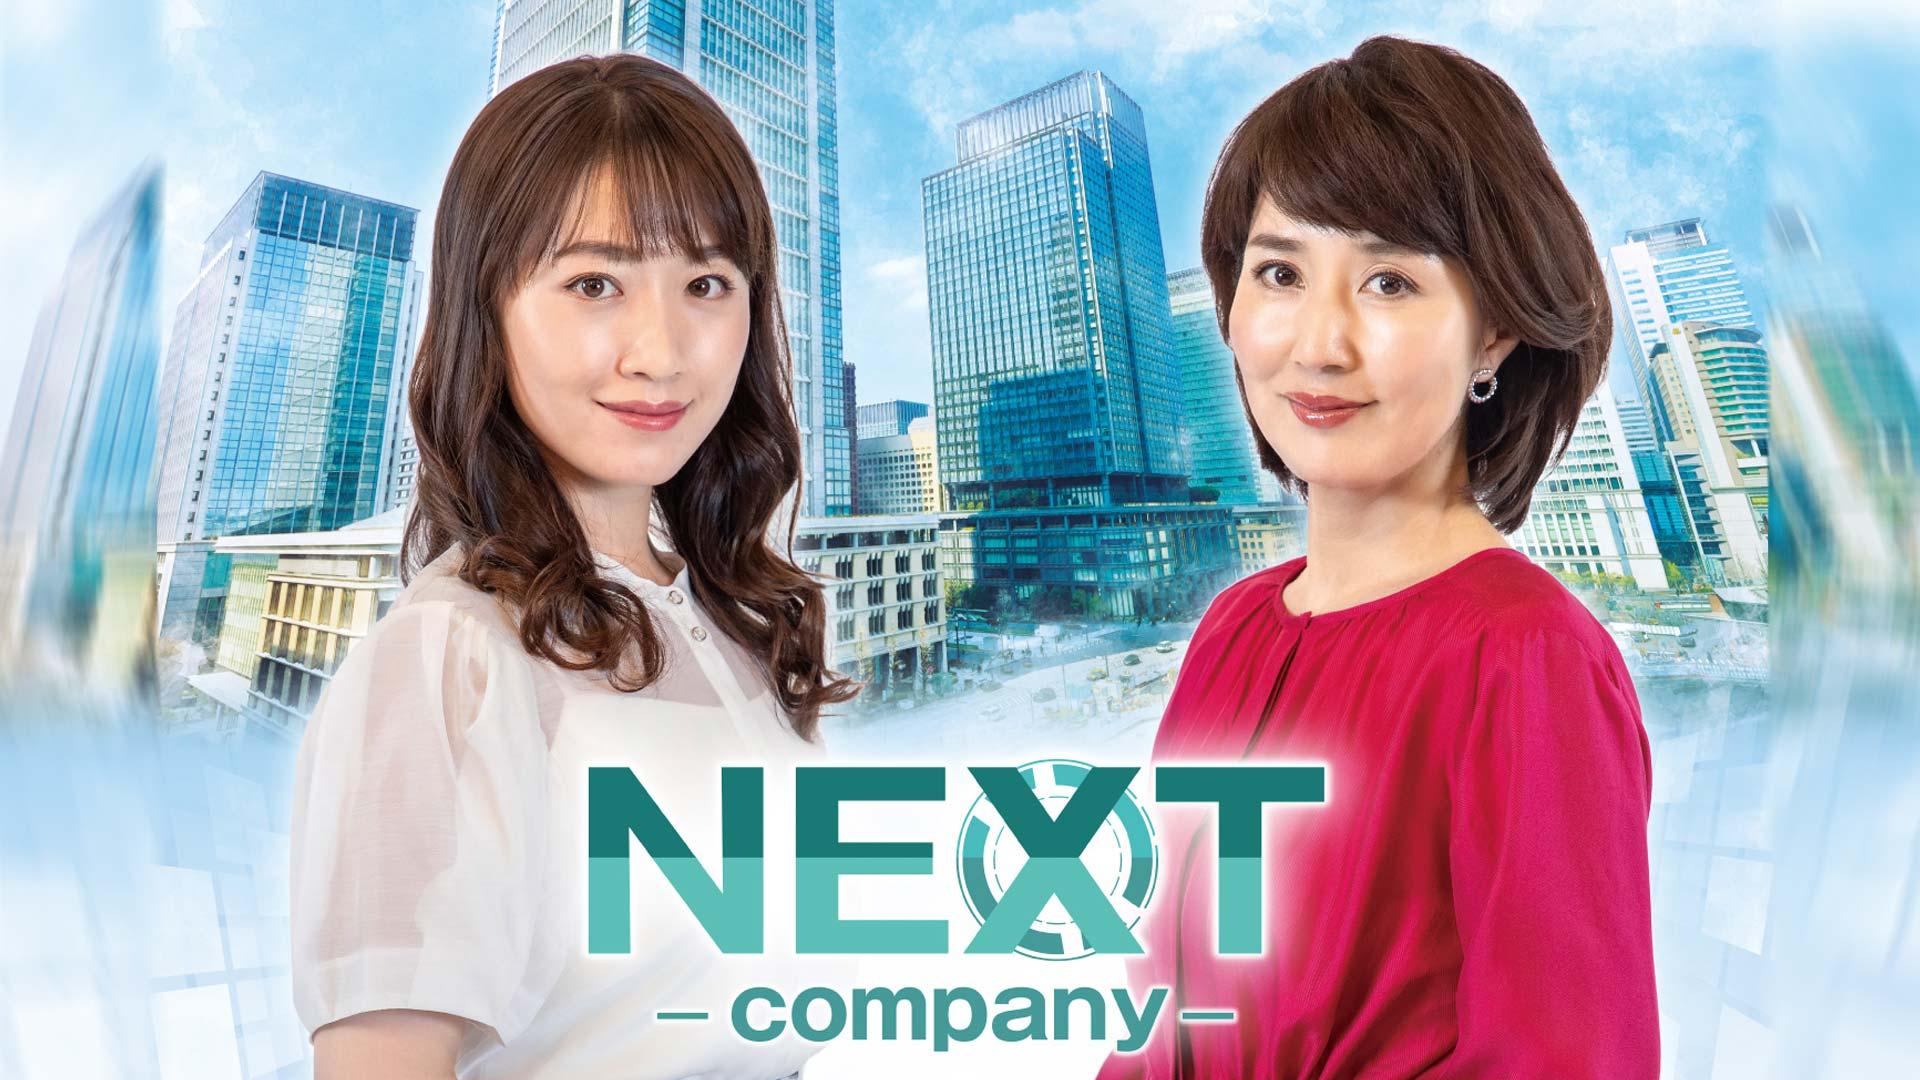 NEXT company